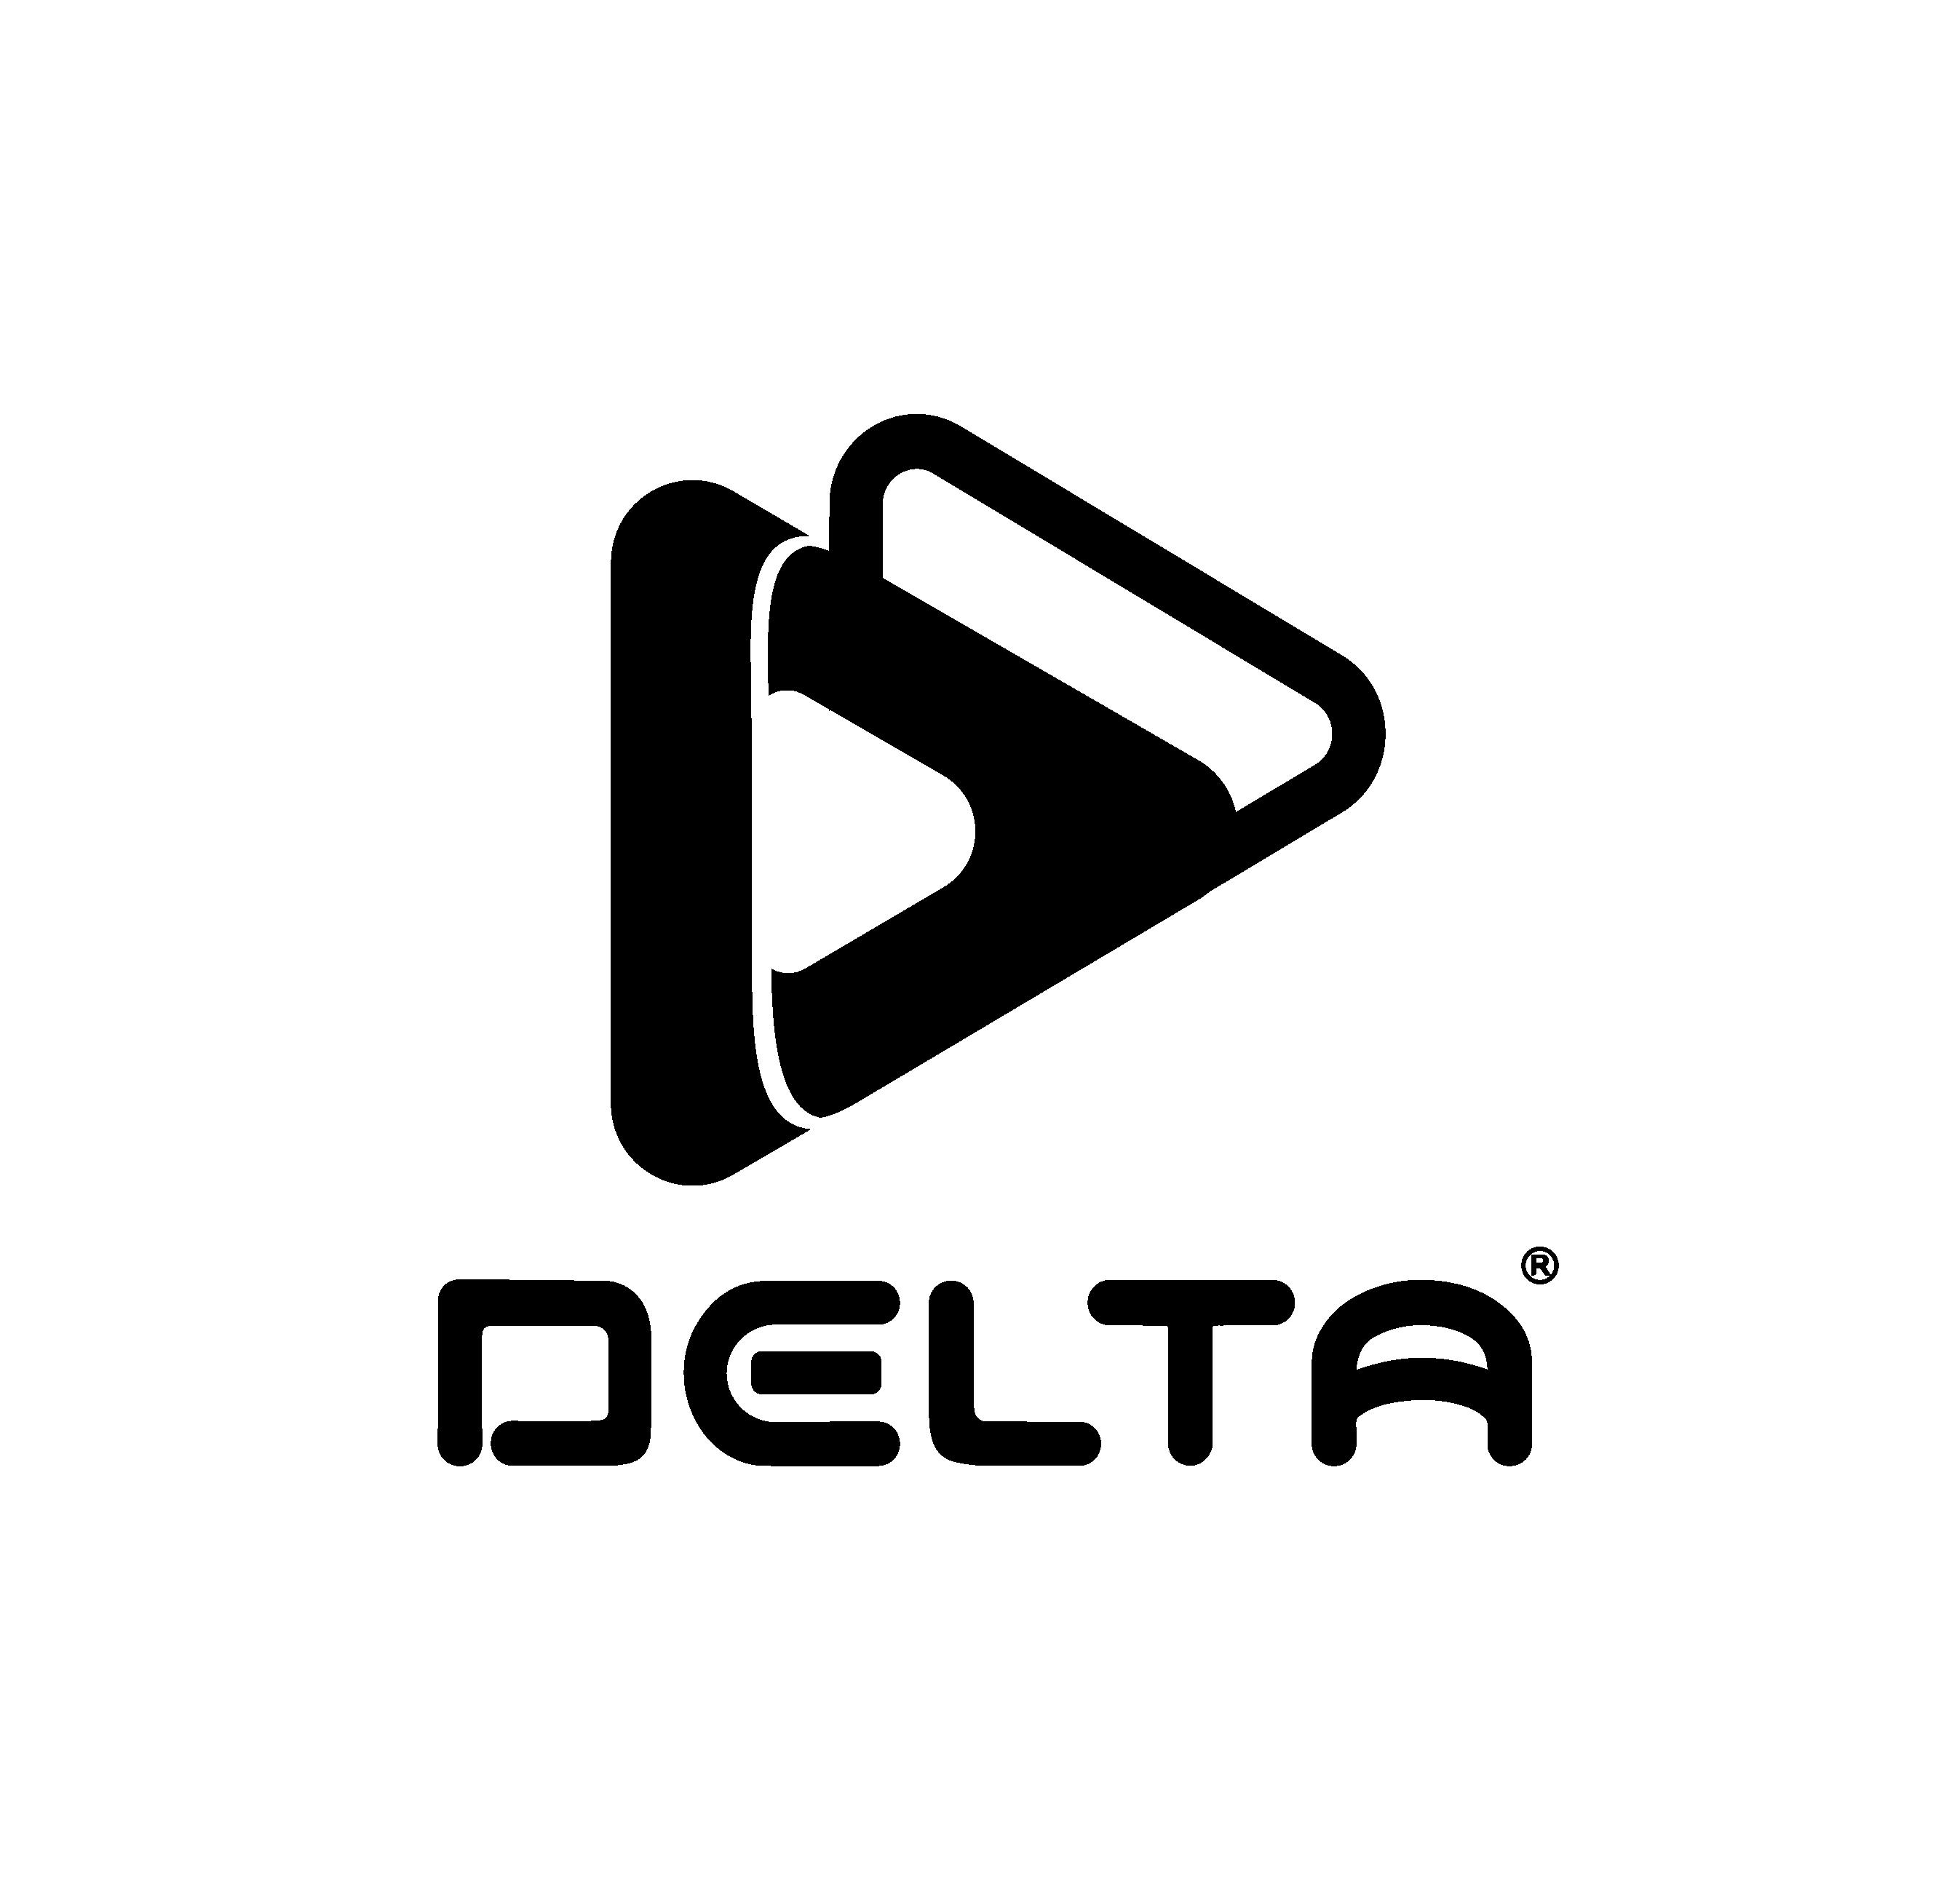 DELTA SPORT – Thời trang thể thao Việt Nam